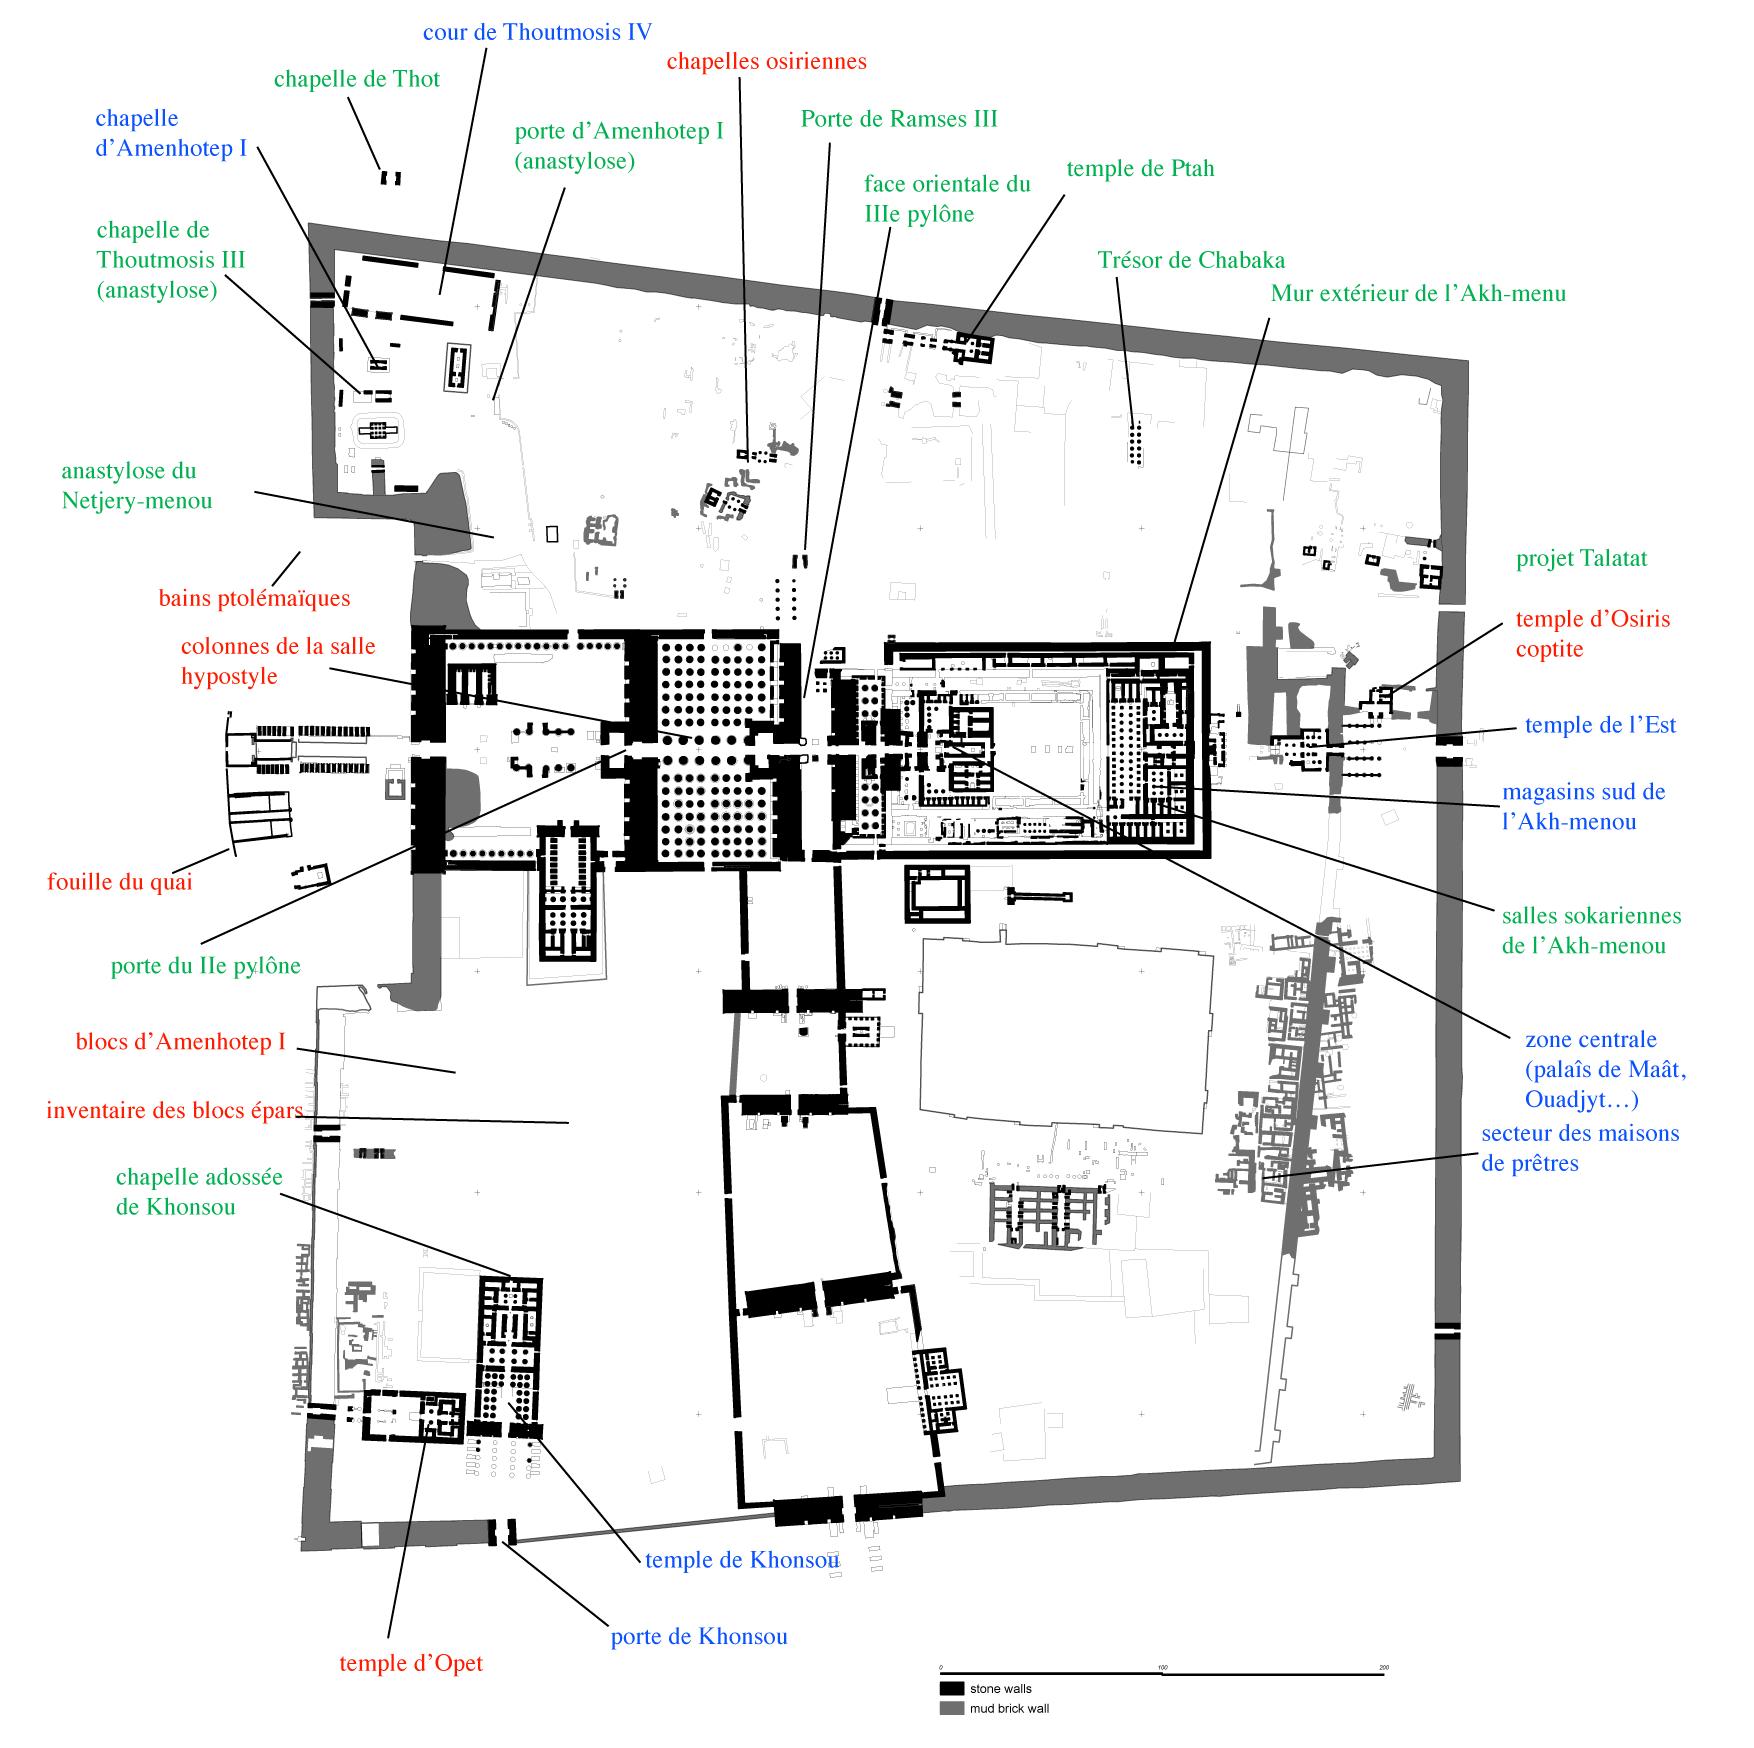 Plan du site de Karnak